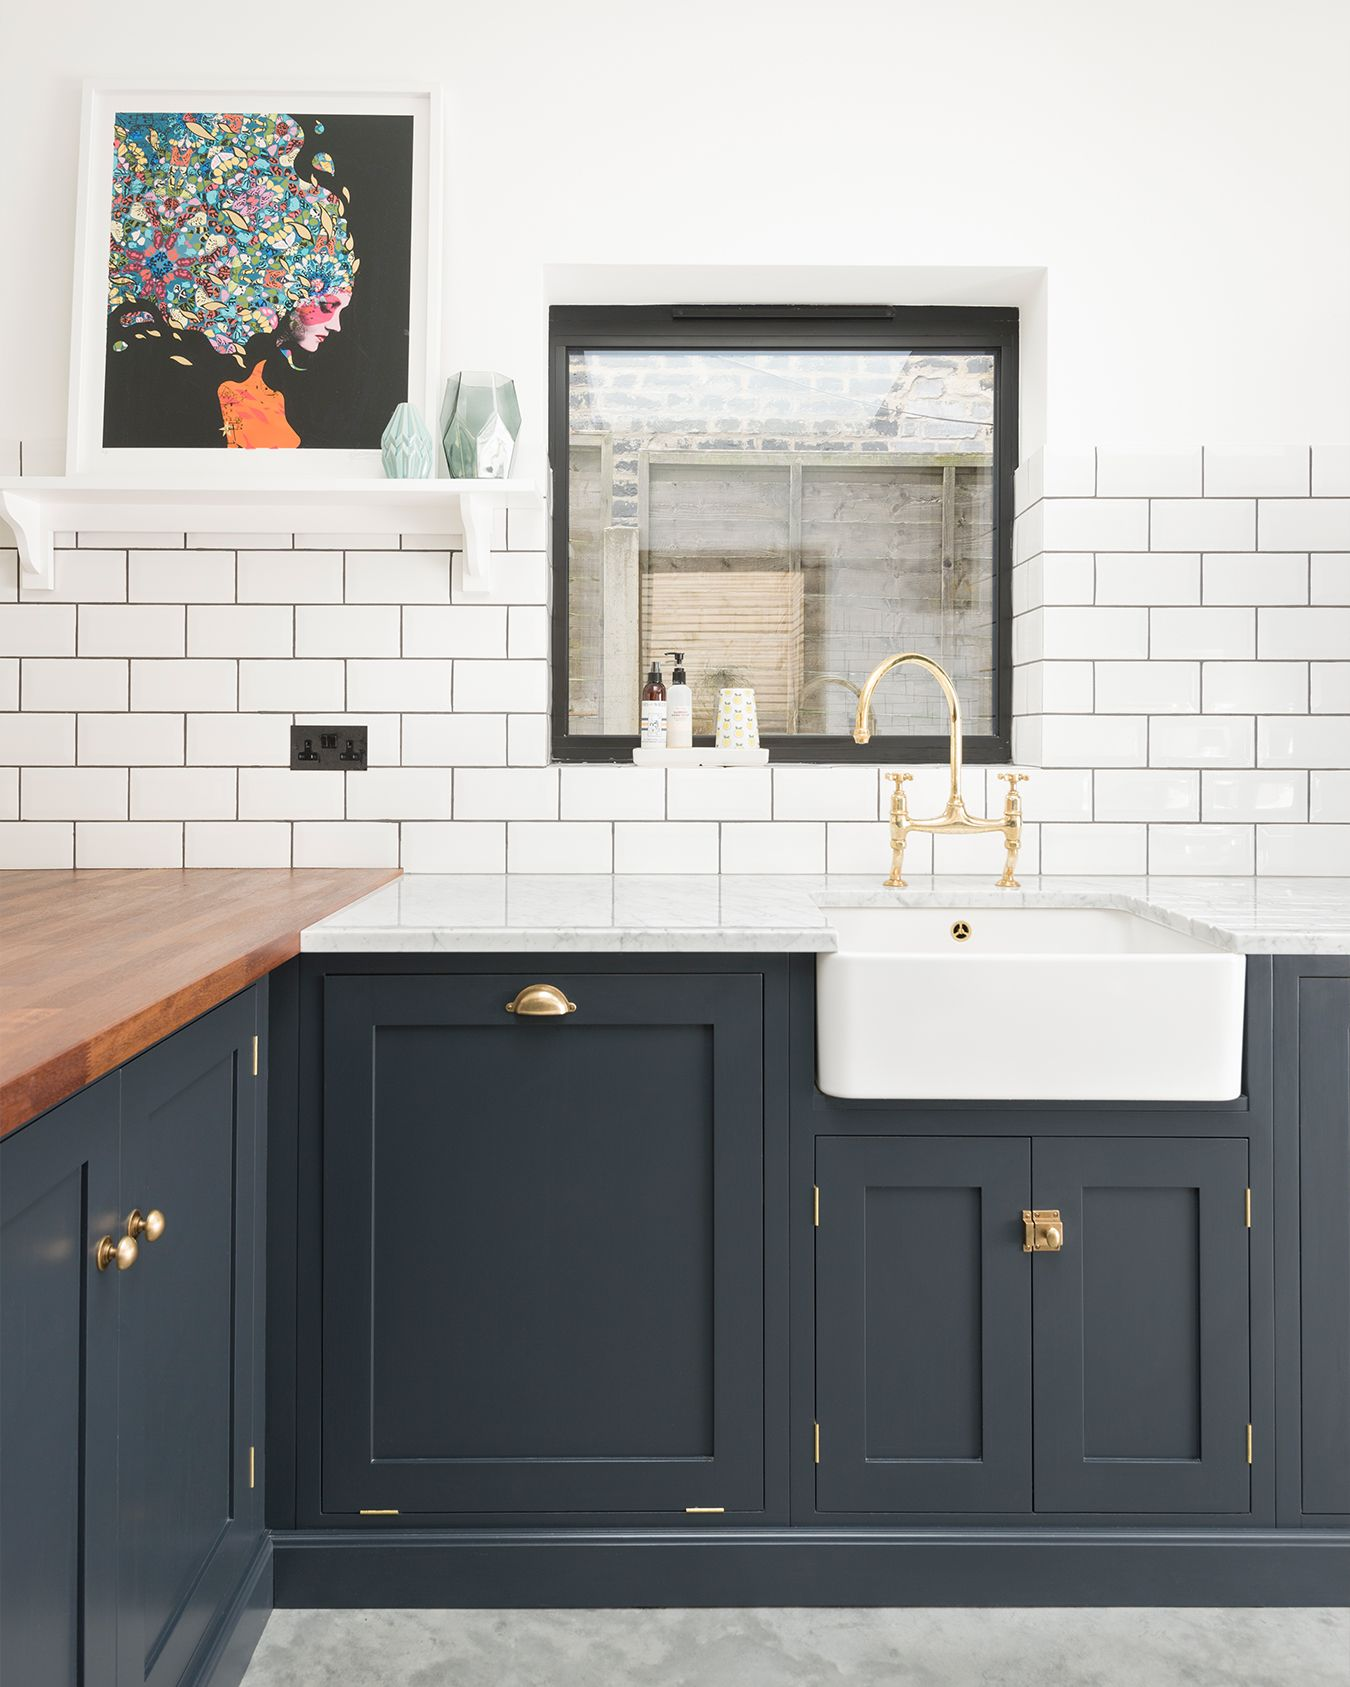 Shaker Kitchens by deVOL – Handmade Painted English Kitchens